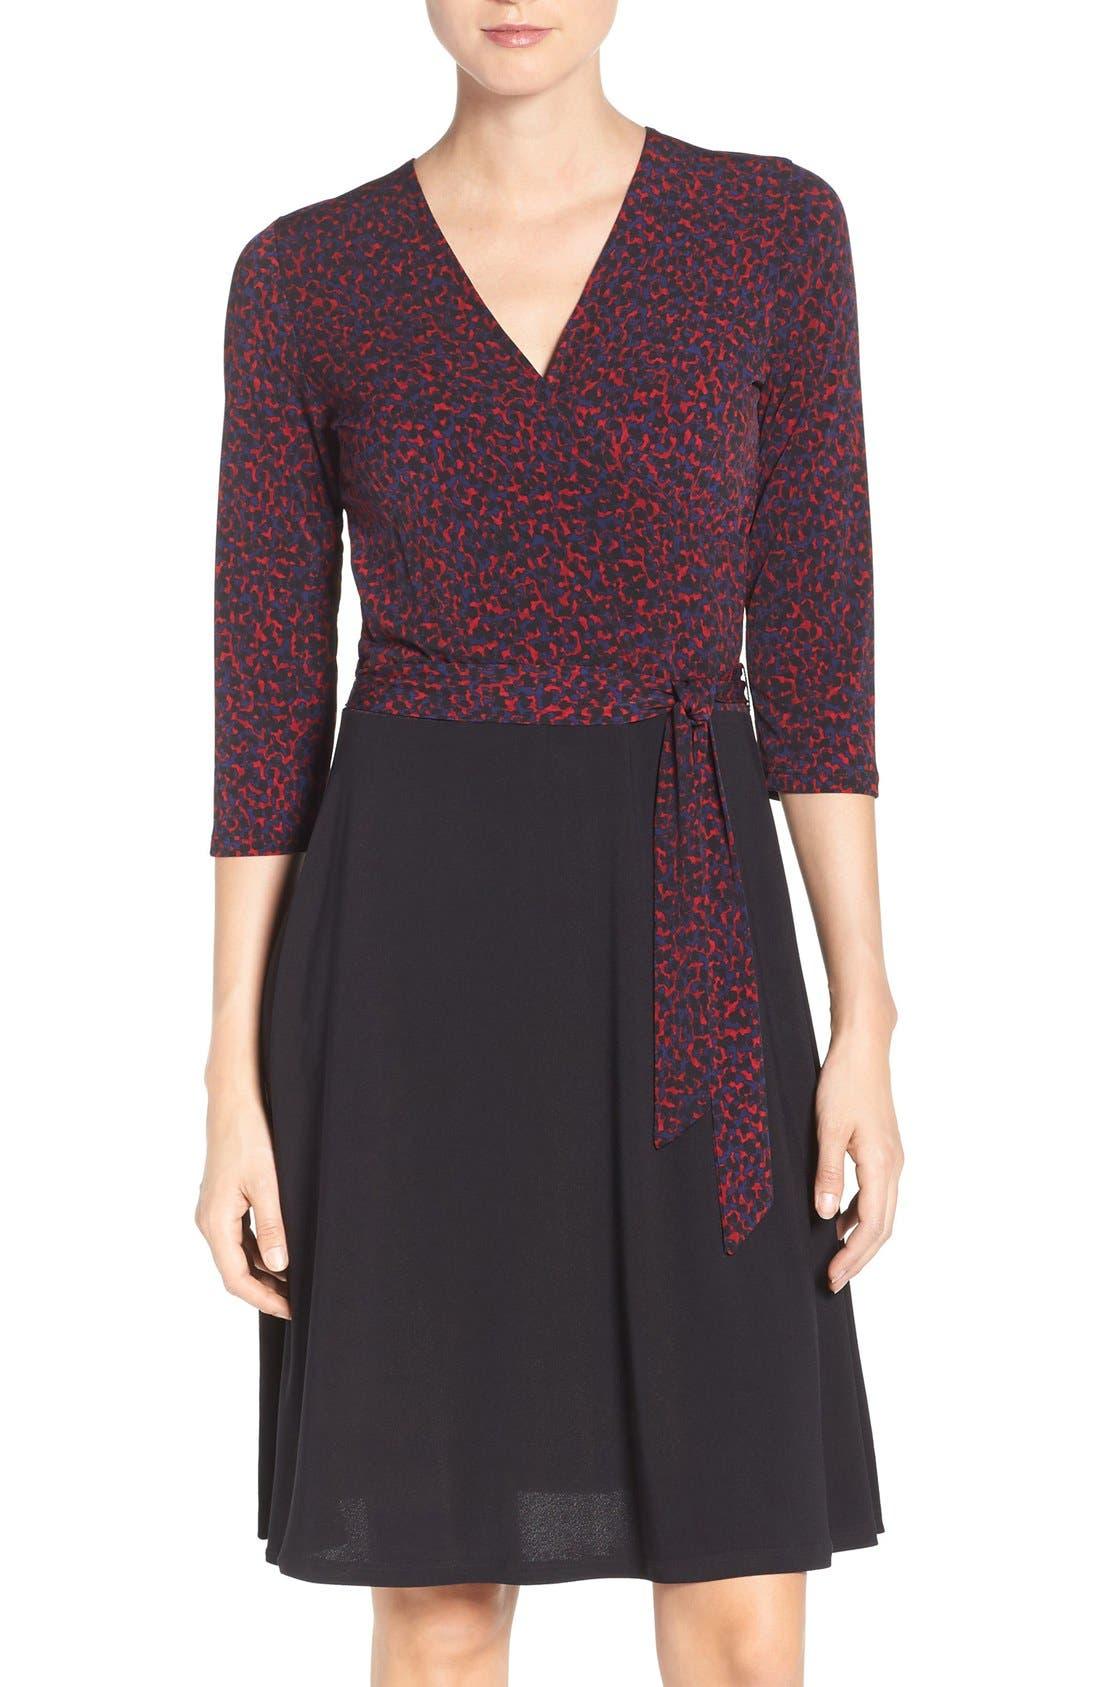 Leota 'Perfect Combo' Stretch Wrap Dress